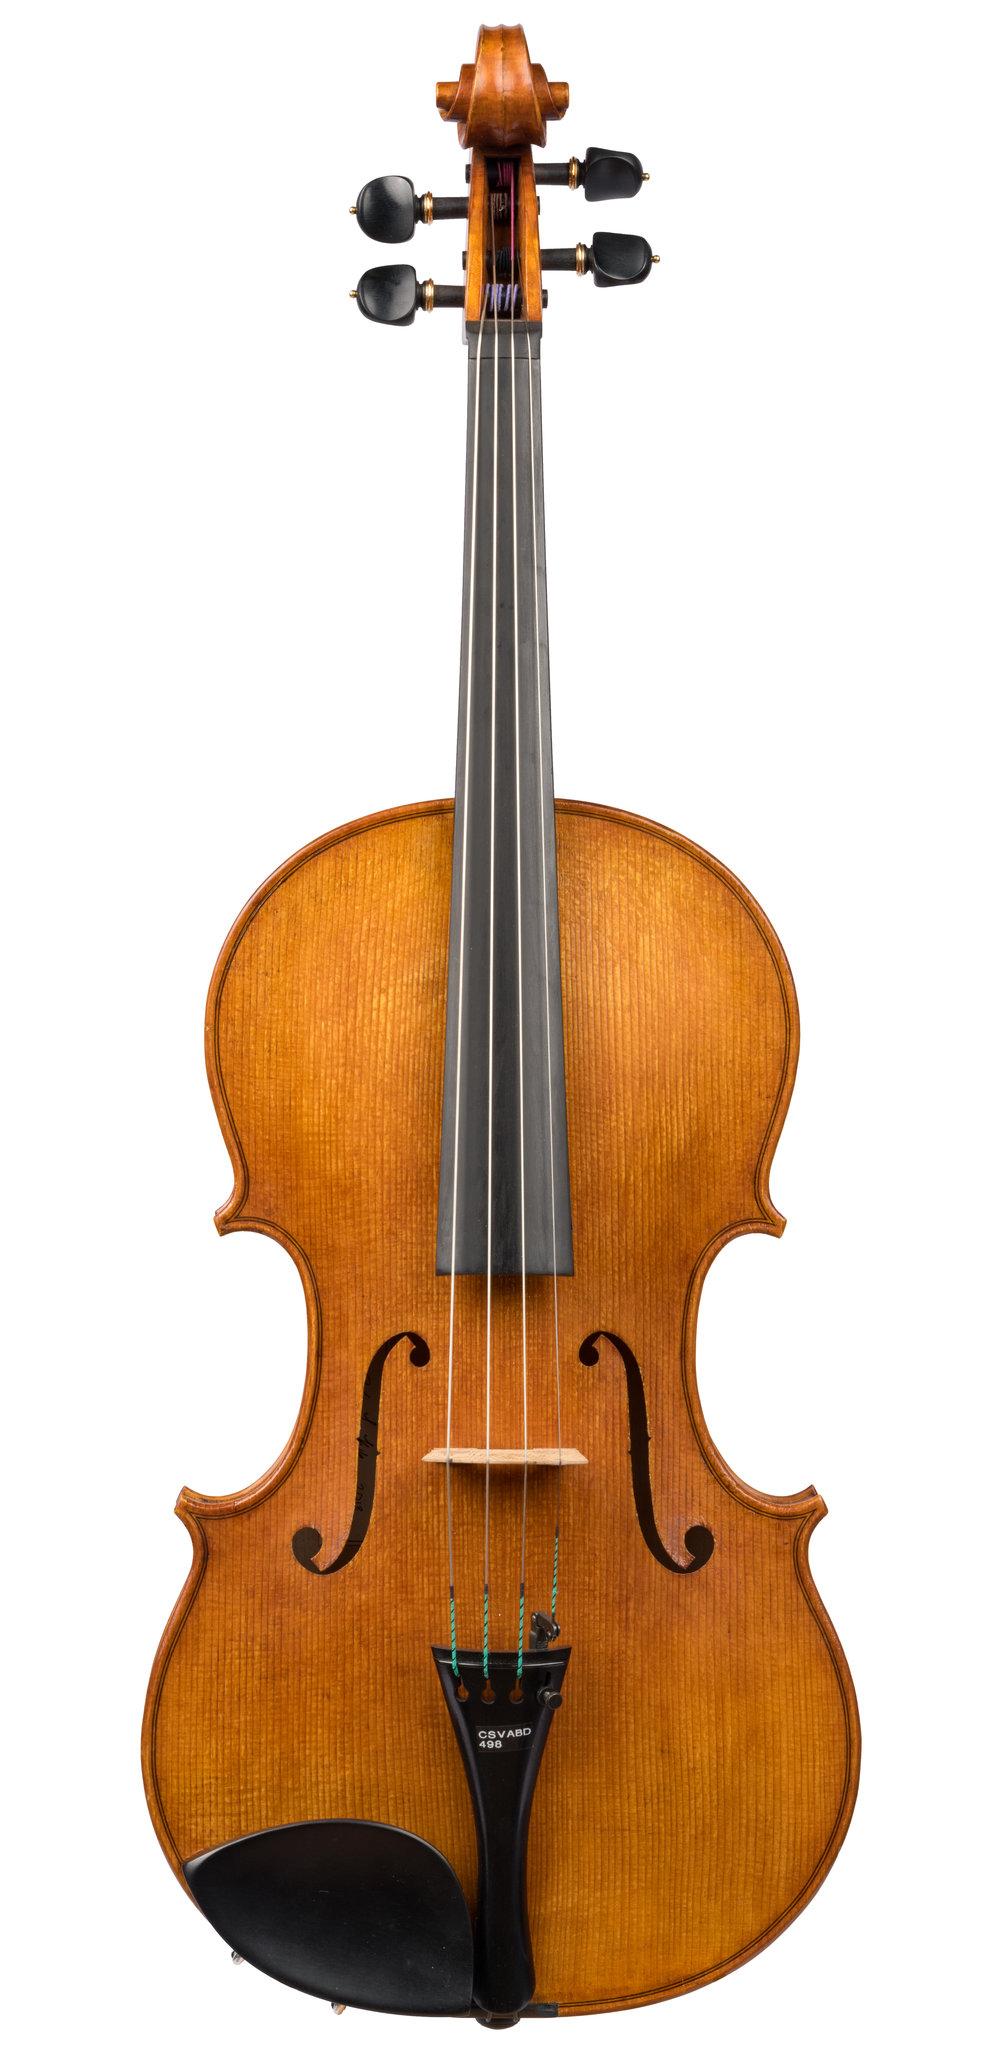 Dylan L. Kole viola, Chicago, 2018, 16 1/4